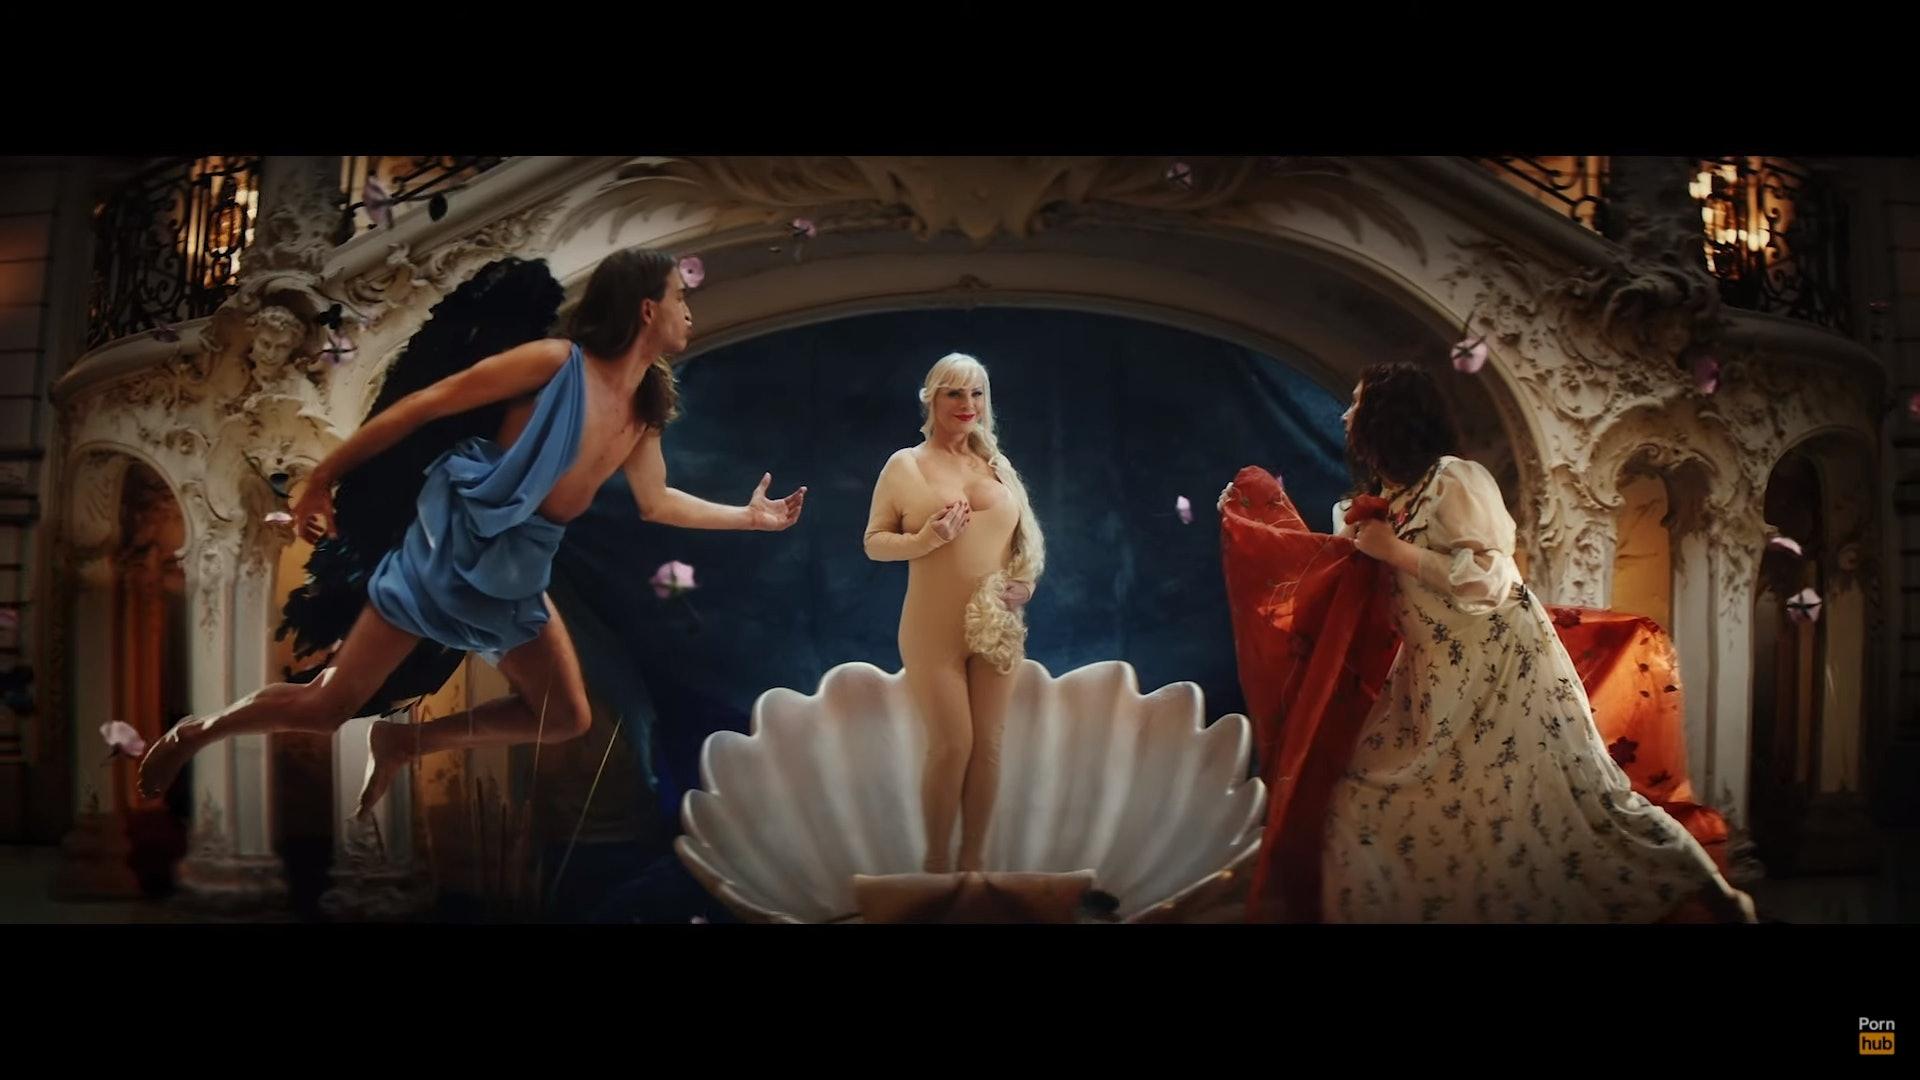 Pornhub找AV女优扮名画著名场面 被乌菲兹美术馆控告